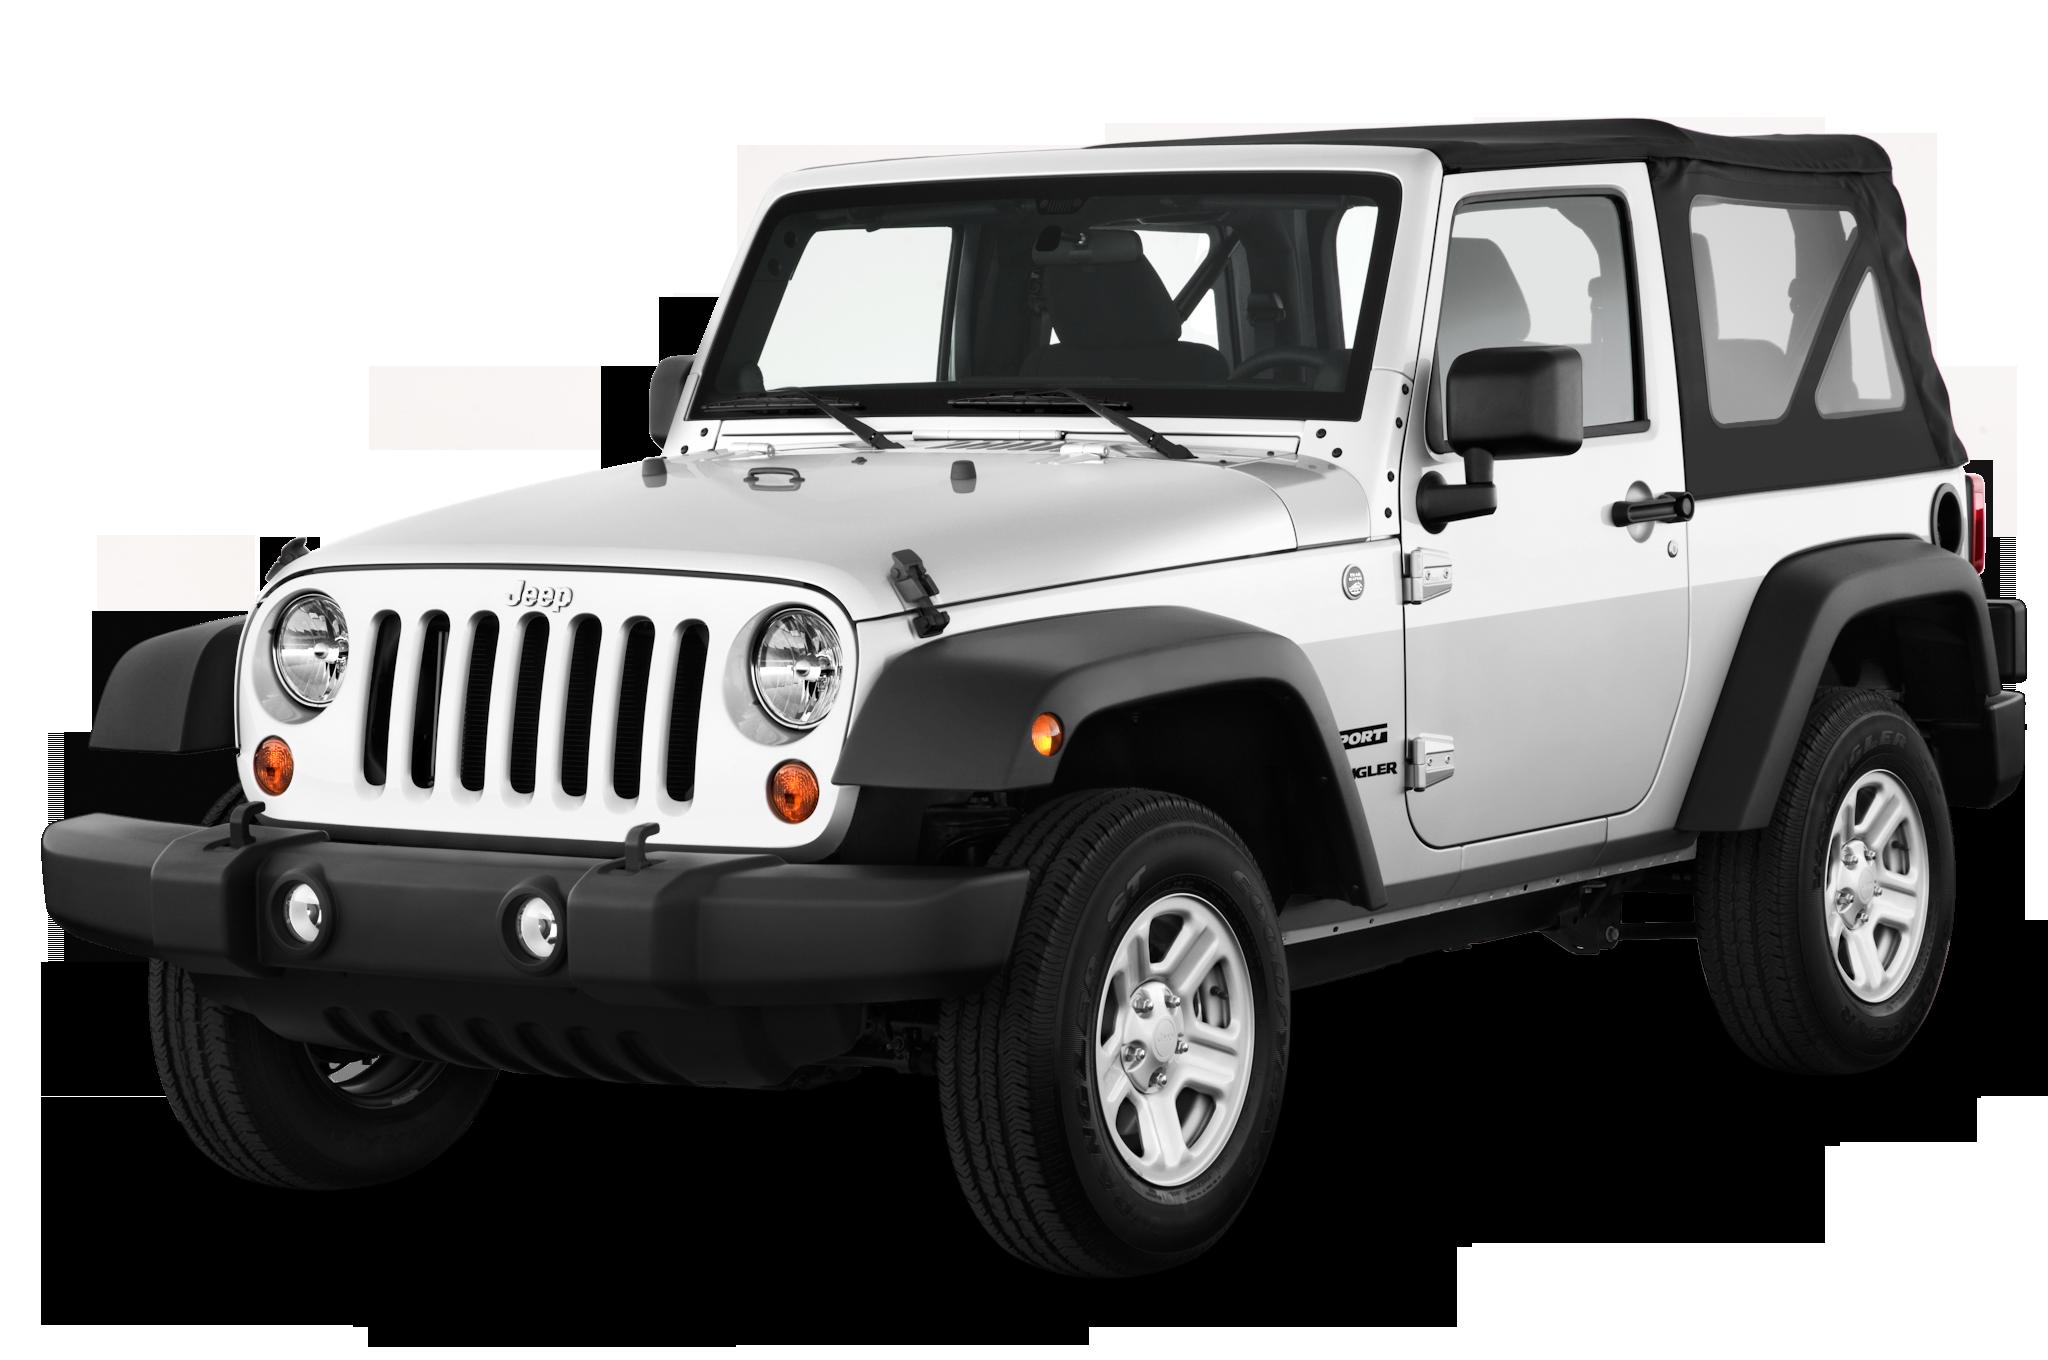 2014 jeep wrangler willys wheeler edition revealed automobile magazine. Black Bedroom Furniture Sets. Home Design Ideas